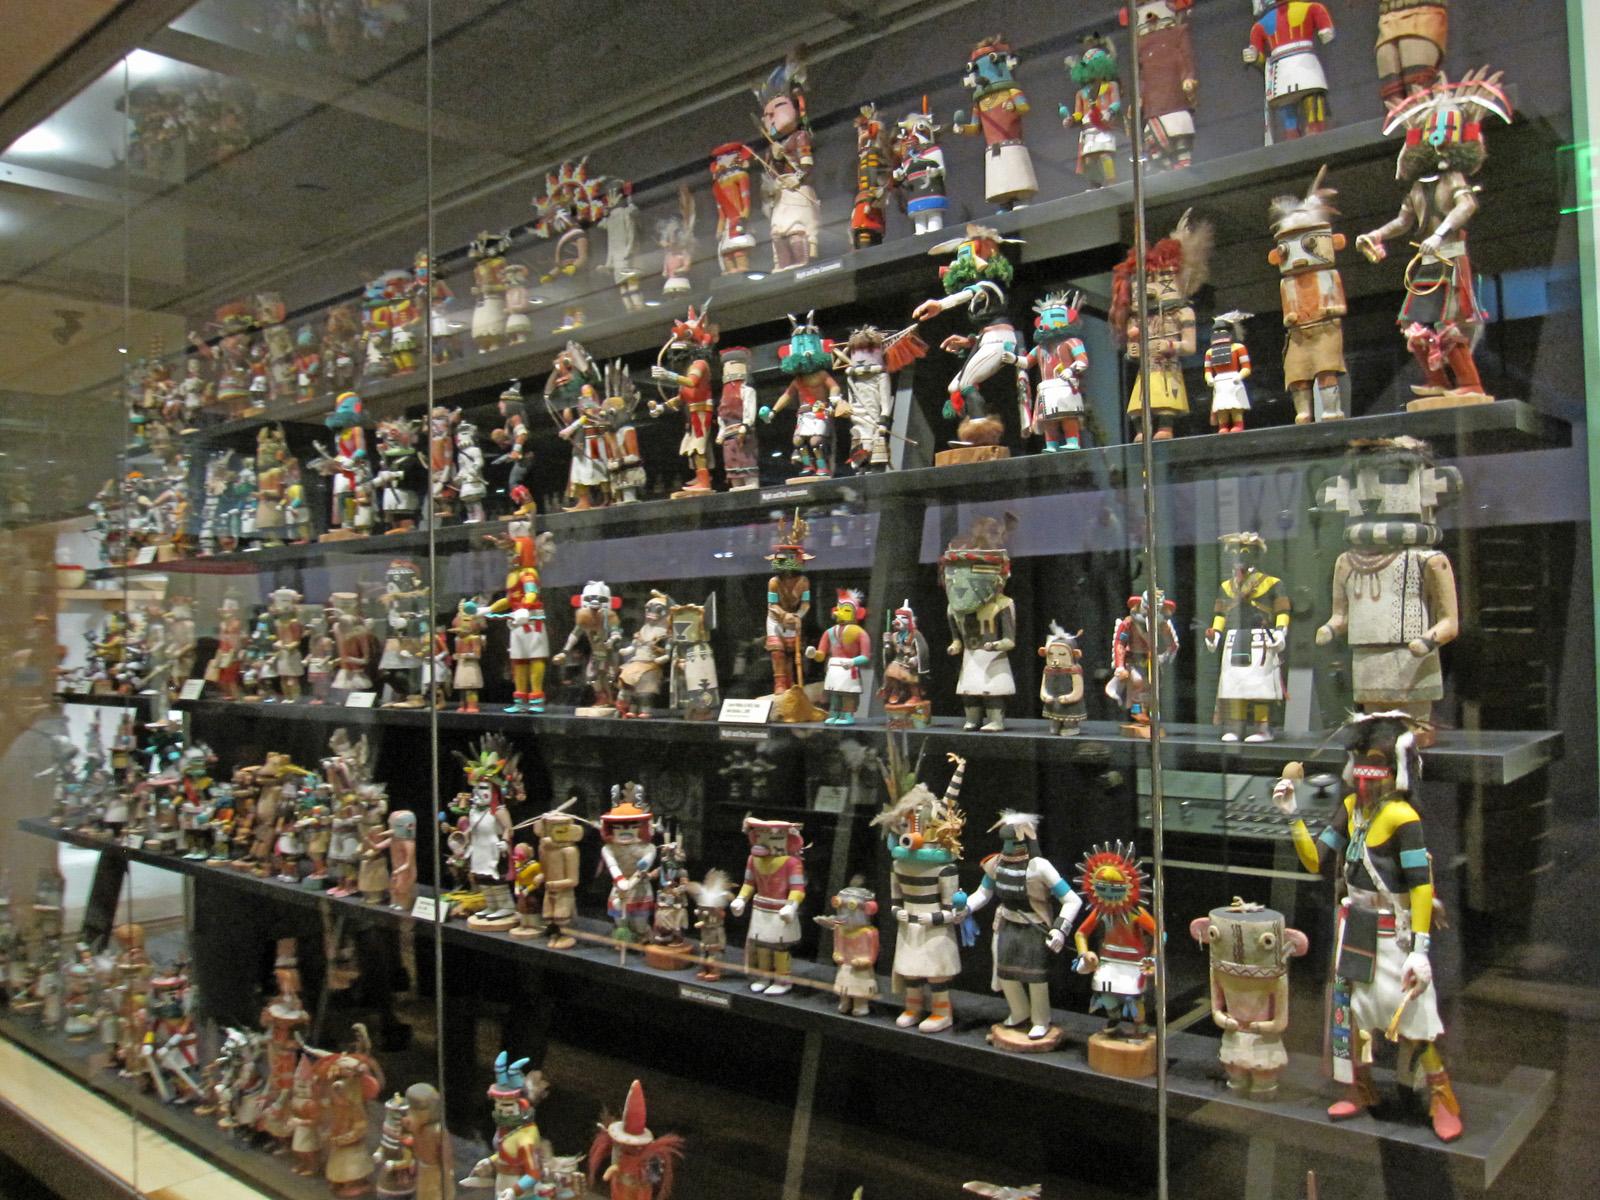 File:Hopi Katsina collection, Heard Museum, Phoenix (8226715938).jpg ...